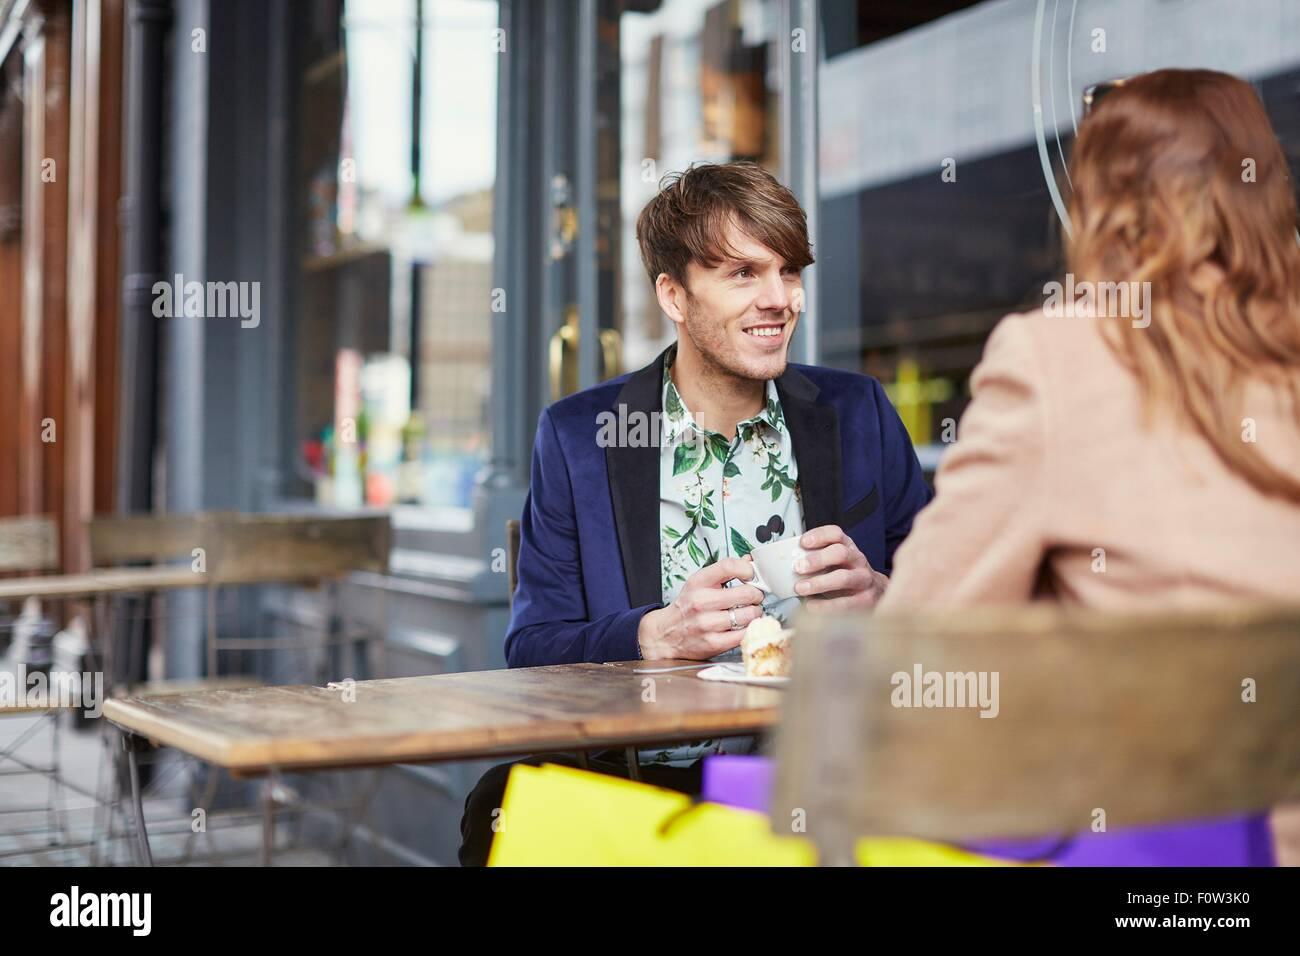 Über Schulter Blick auf paar im Chat im Straßencafé, London, UK Stockbild